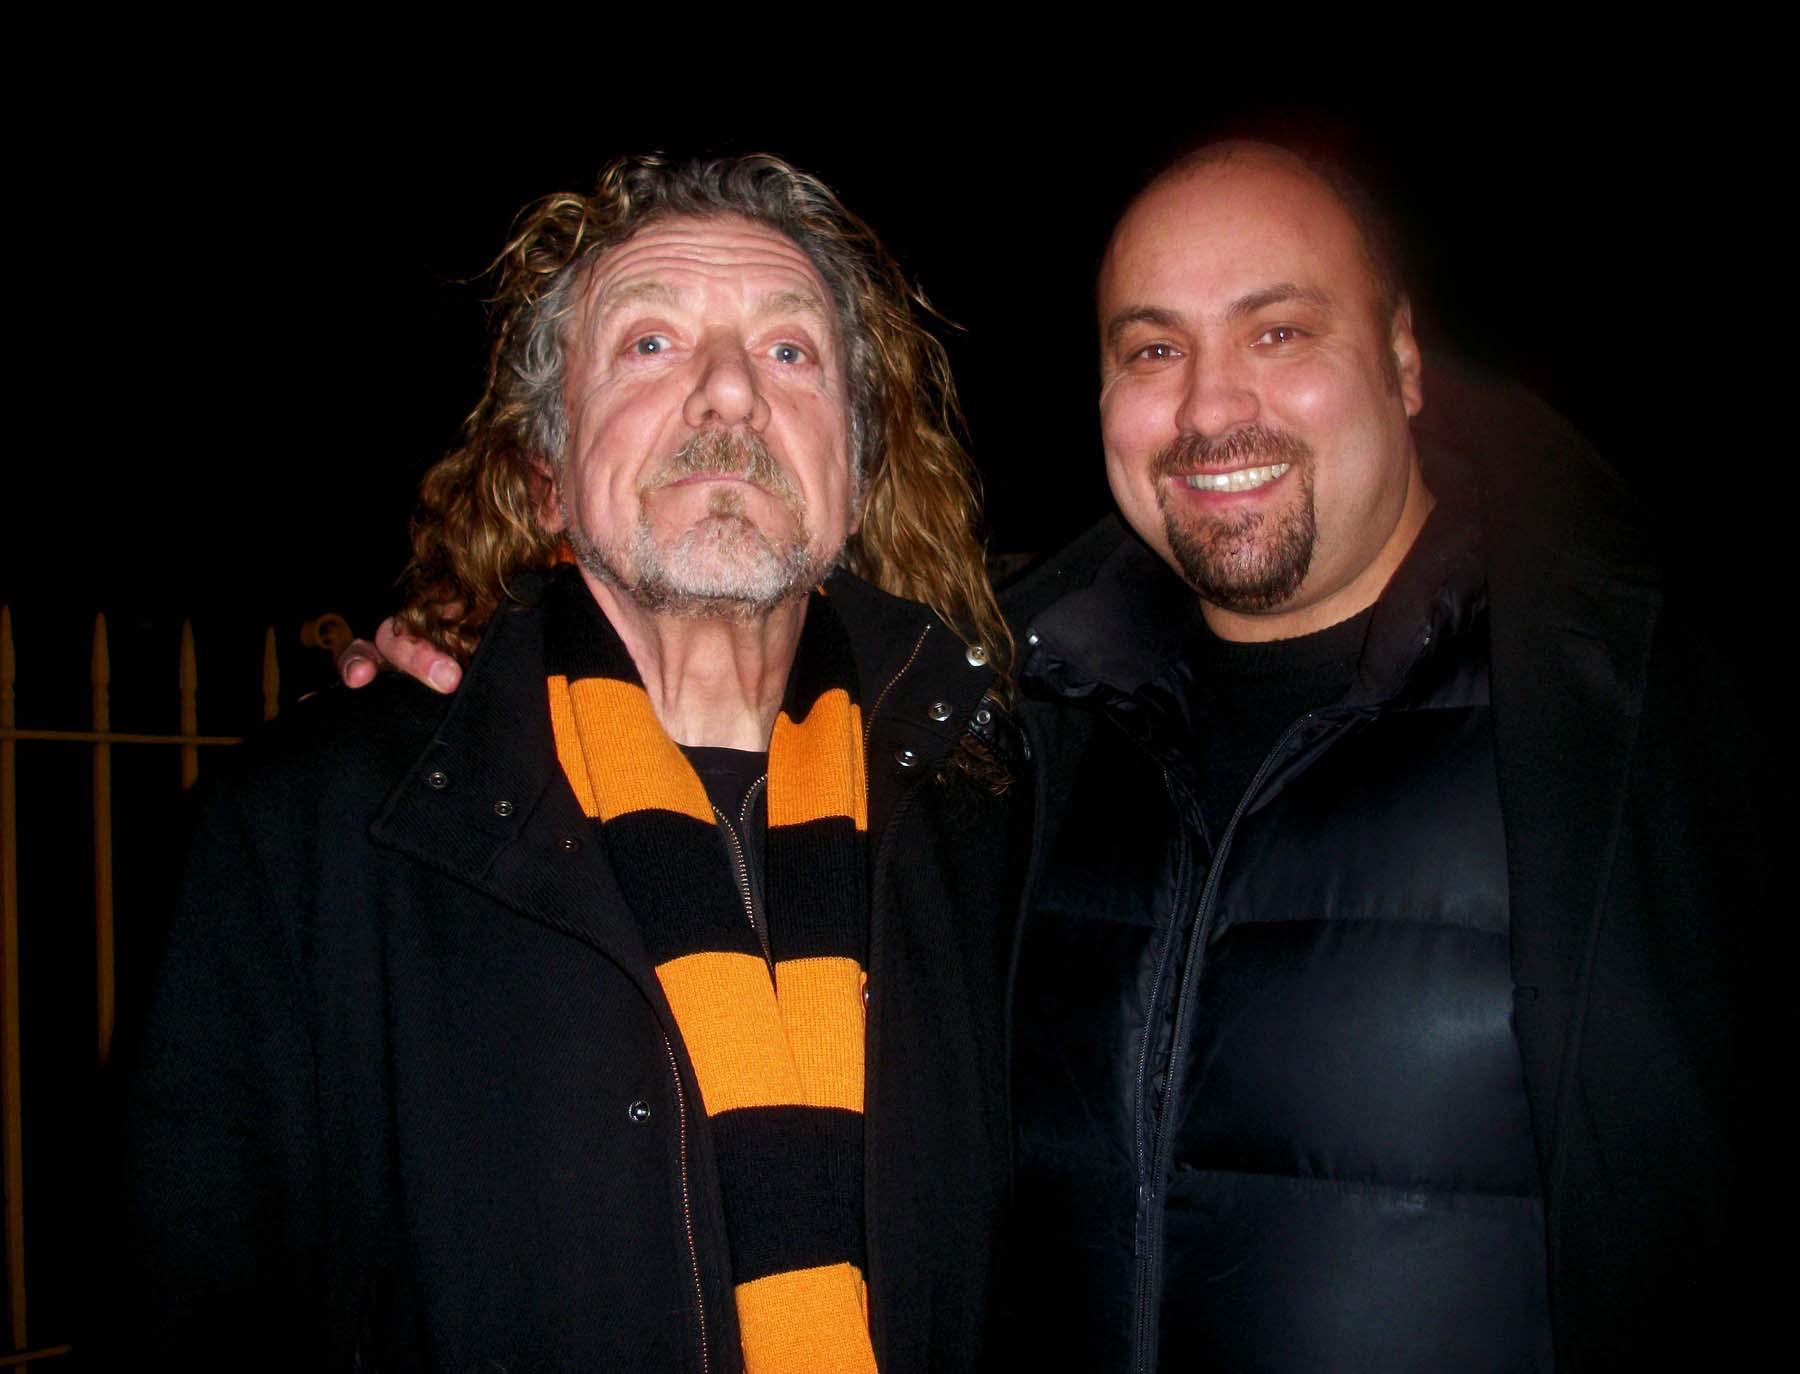 Robert Plant & Dave Sherwood